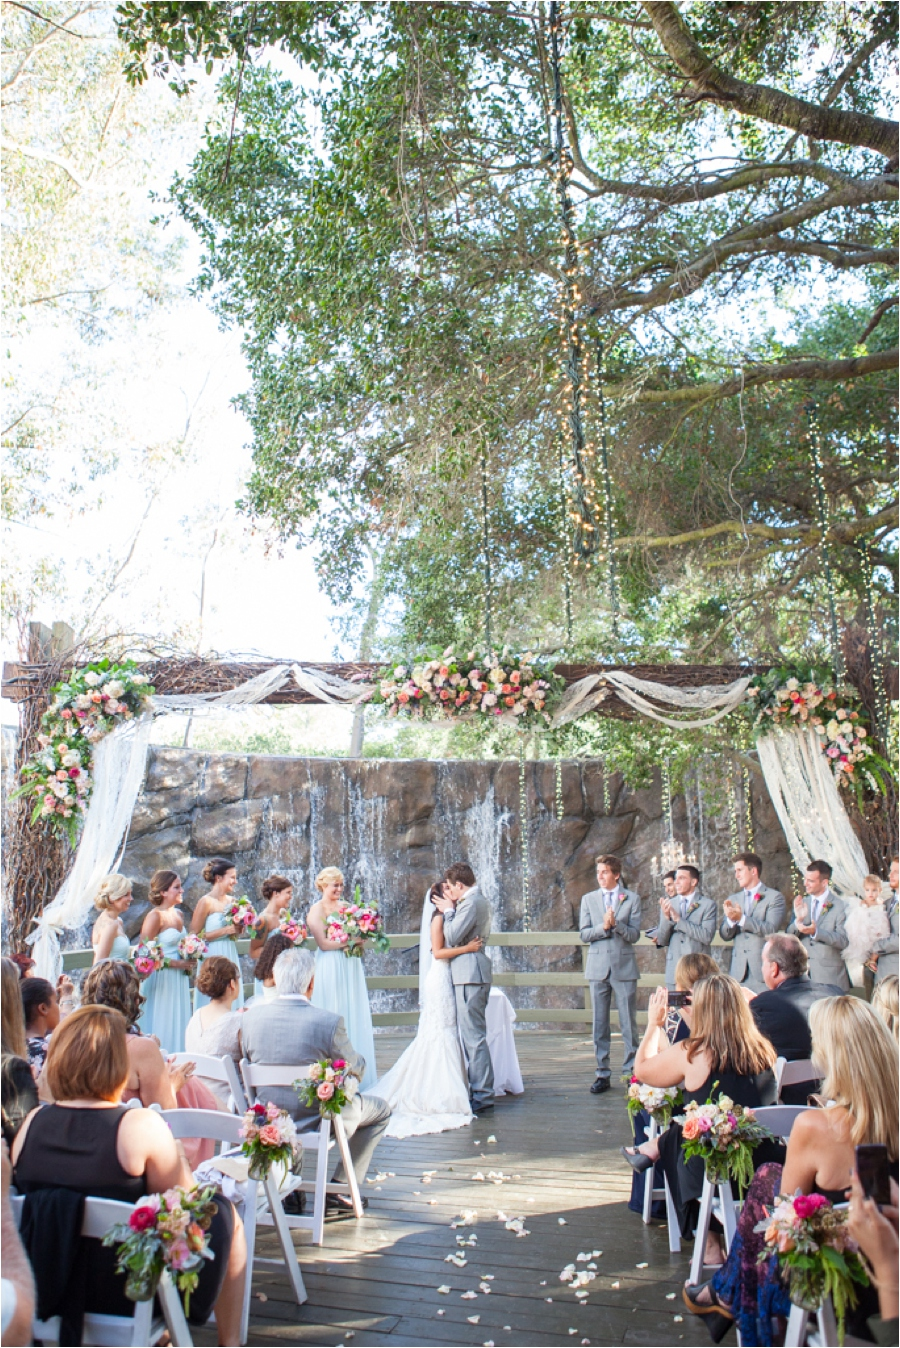 Jasmine and Donny- Calamigos Ranch Wedding ©Shaun and Skyla Walton-196.jpg